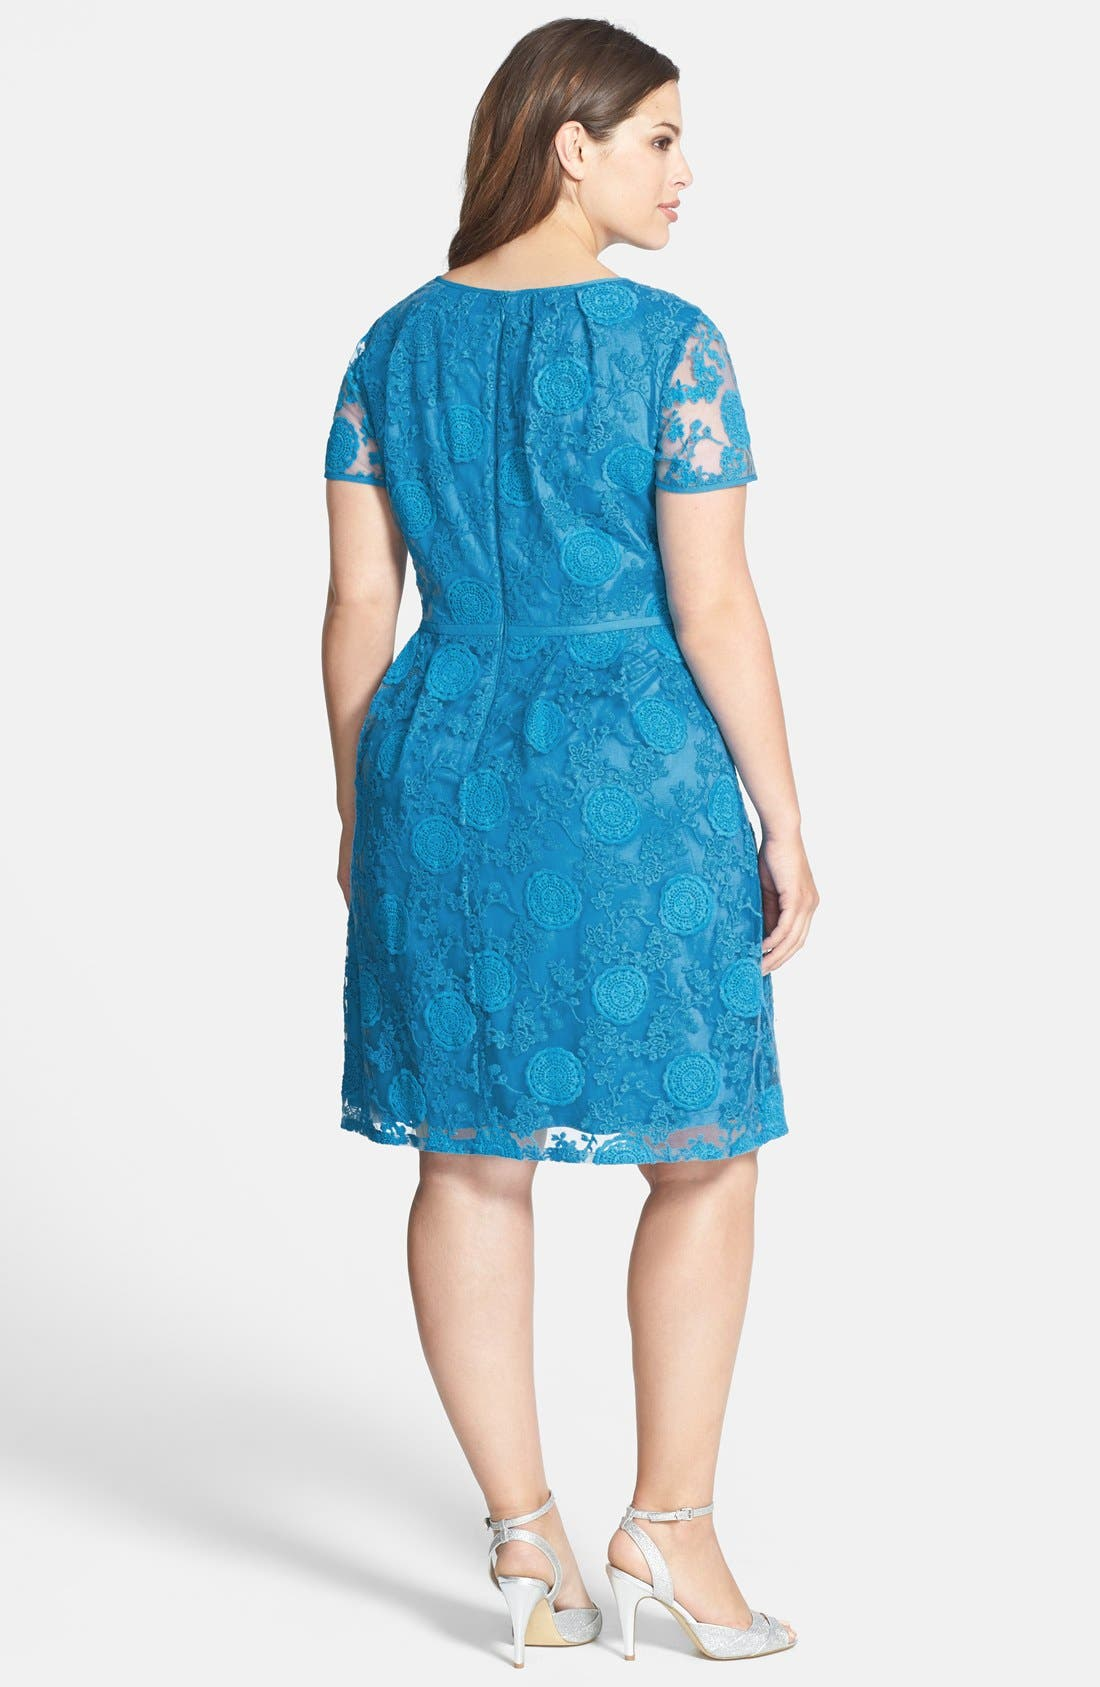 Alternate Image 2  - Adrianna Papell 'Pleats' Lace Dress (Plus Size)